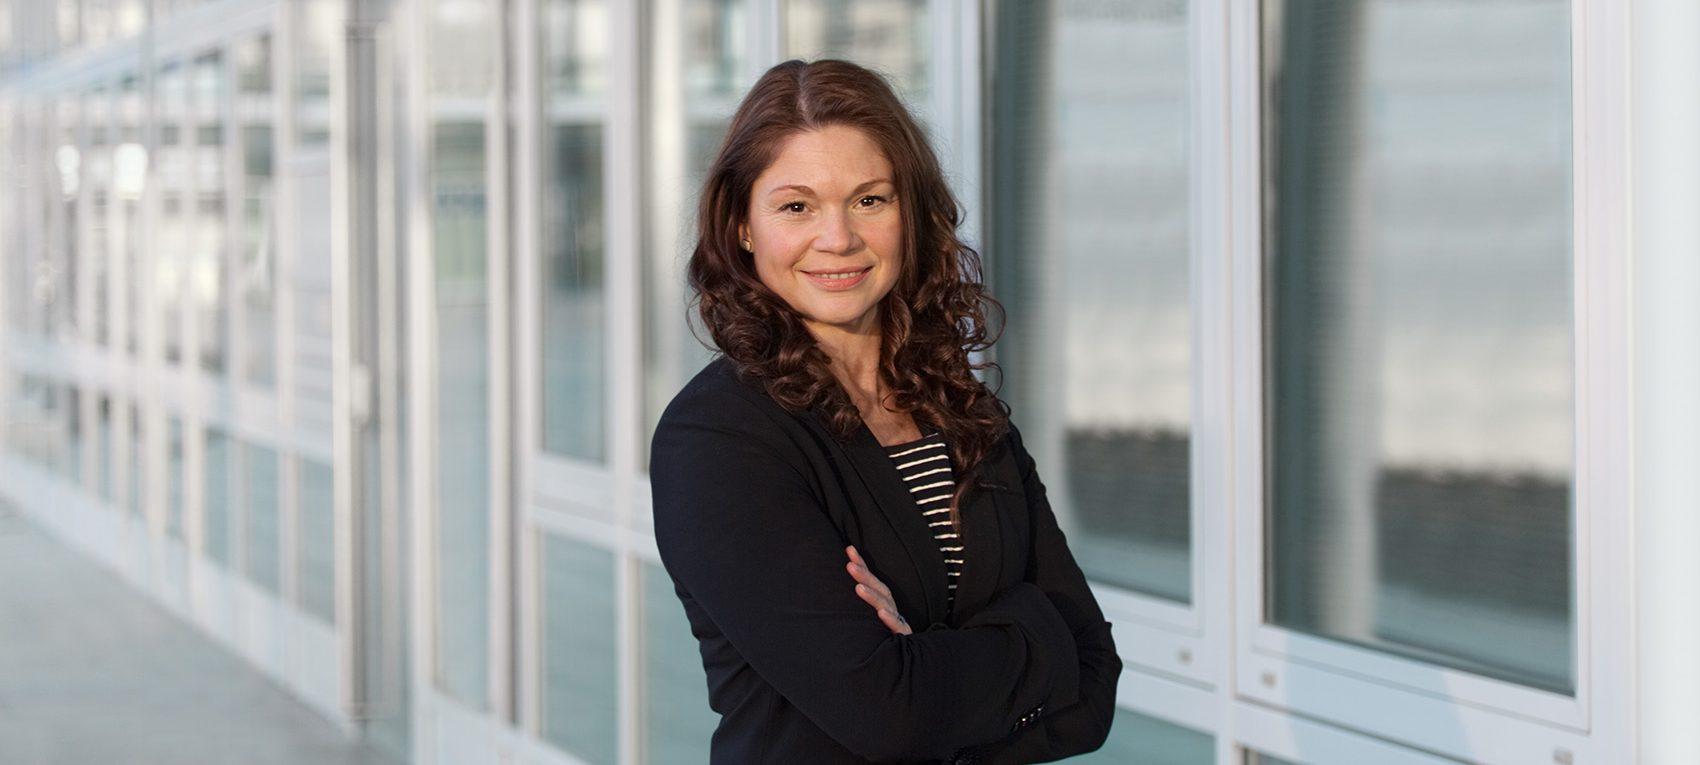 Sabine Simon Coaching, Supervision, Unternehmensberatung